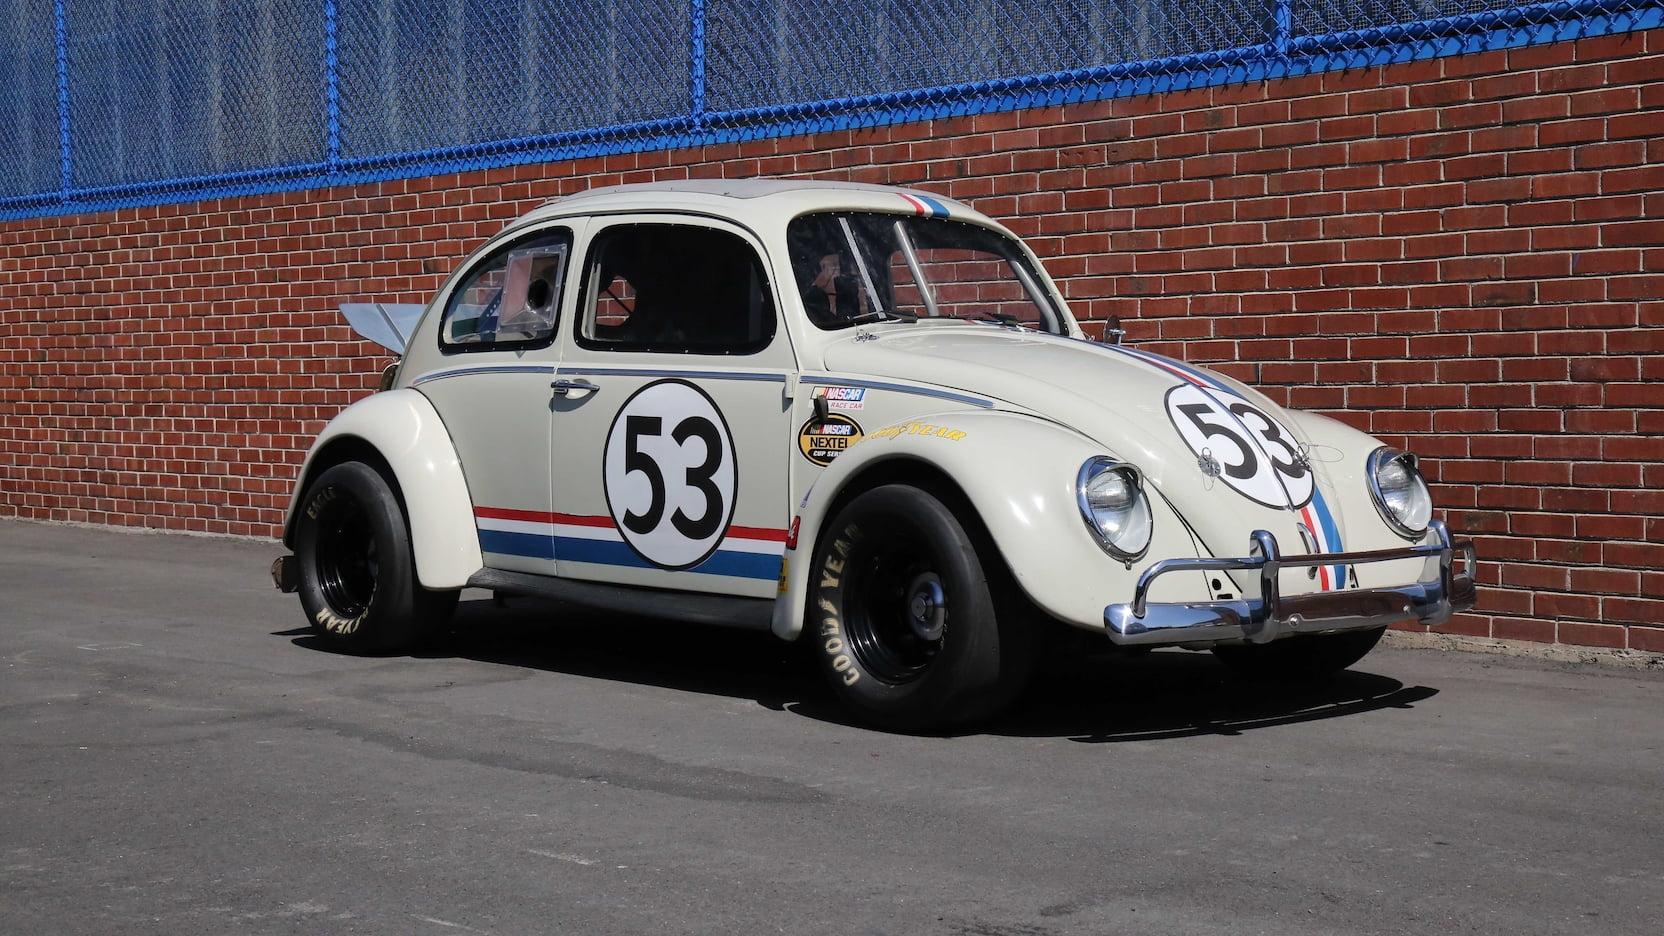 NASCAR Herbie from Herbie: Fully Loaded